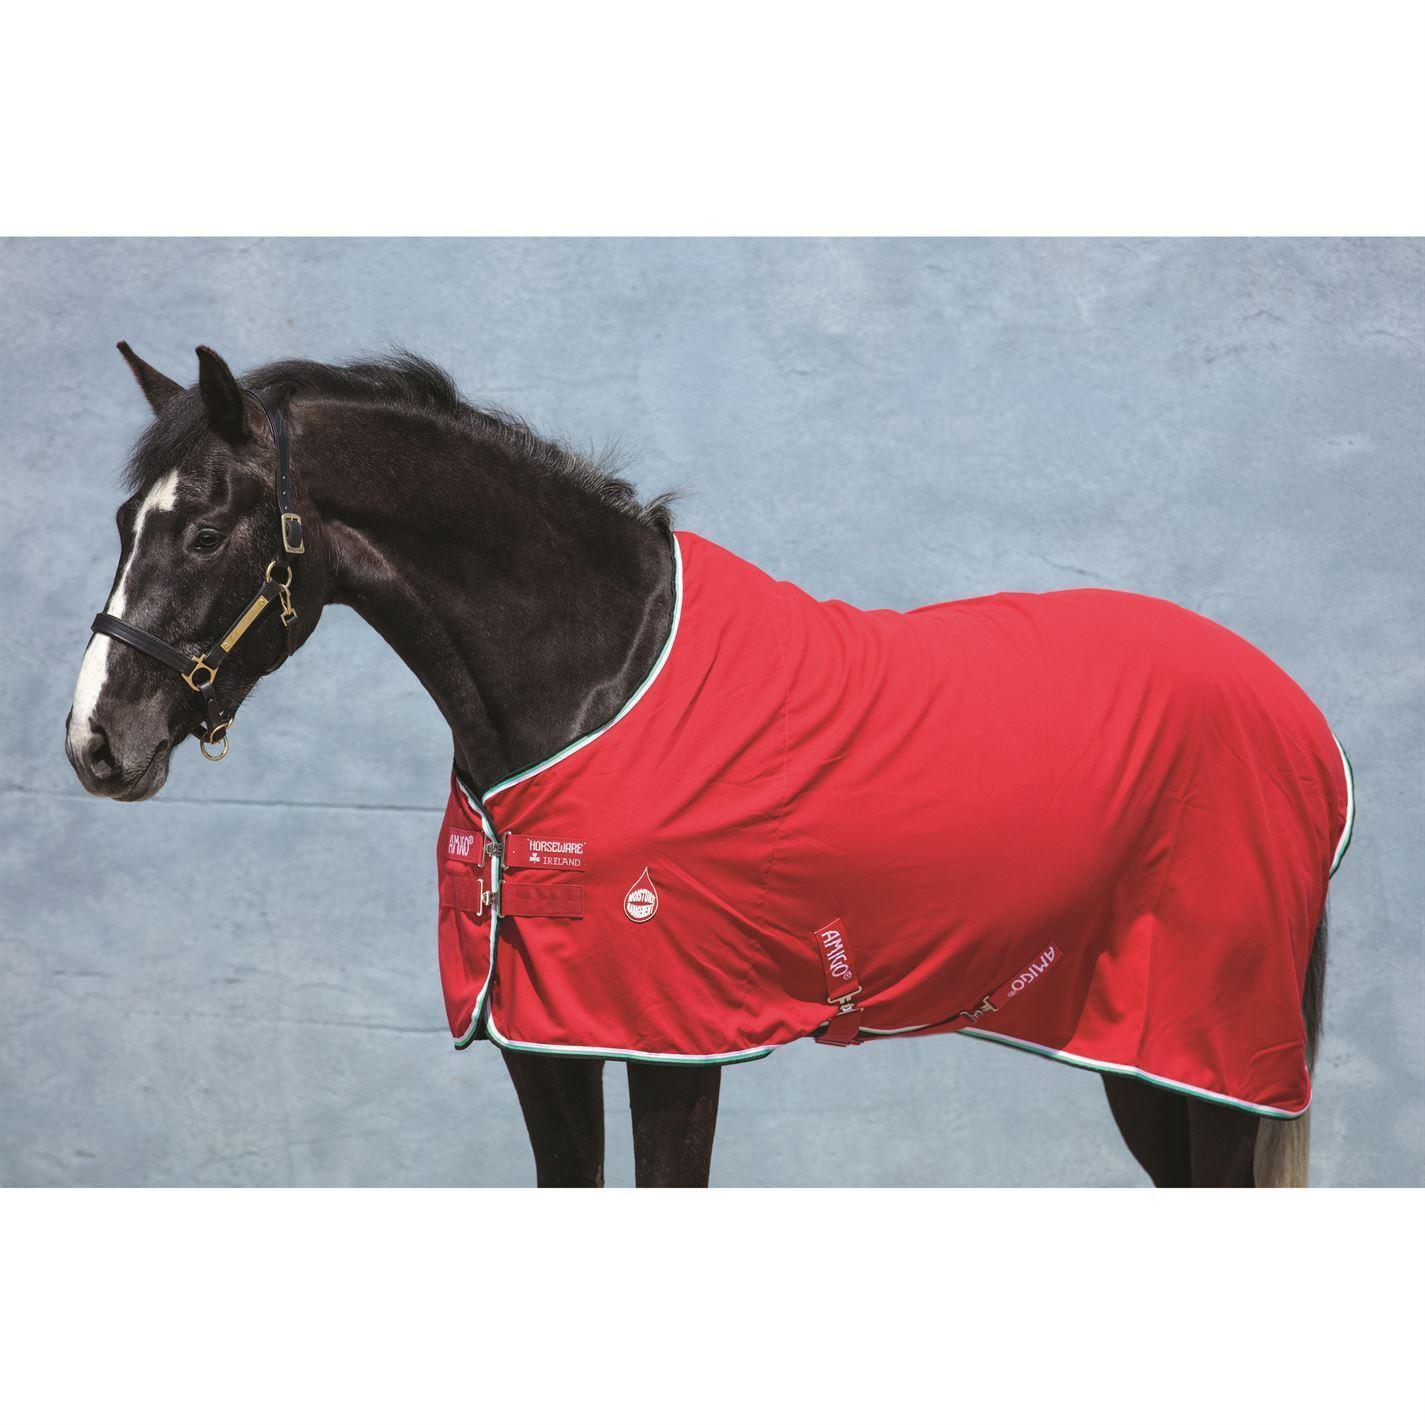 Amigo Unisex Stable Sheet Horse Rug Breathable